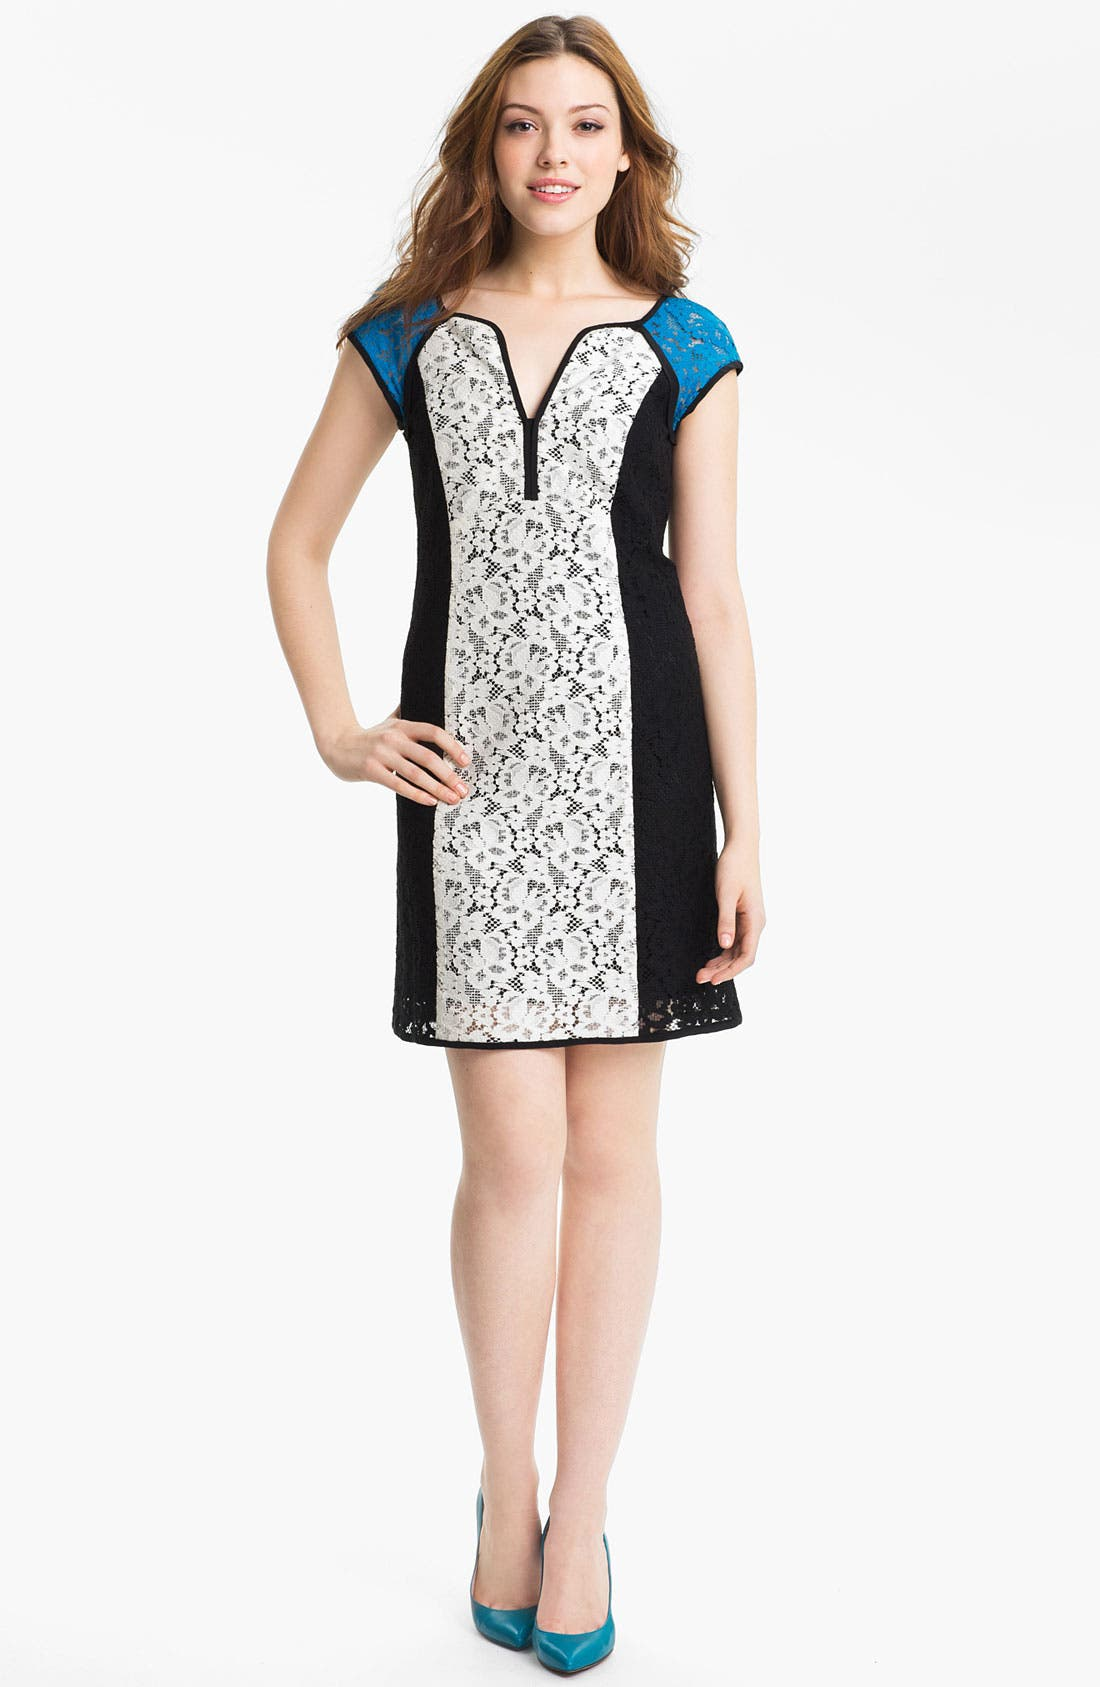 Alternate Image 1 Selected - Nanette Lepore 'Magic Moment' Cotton Blend Shift Dress